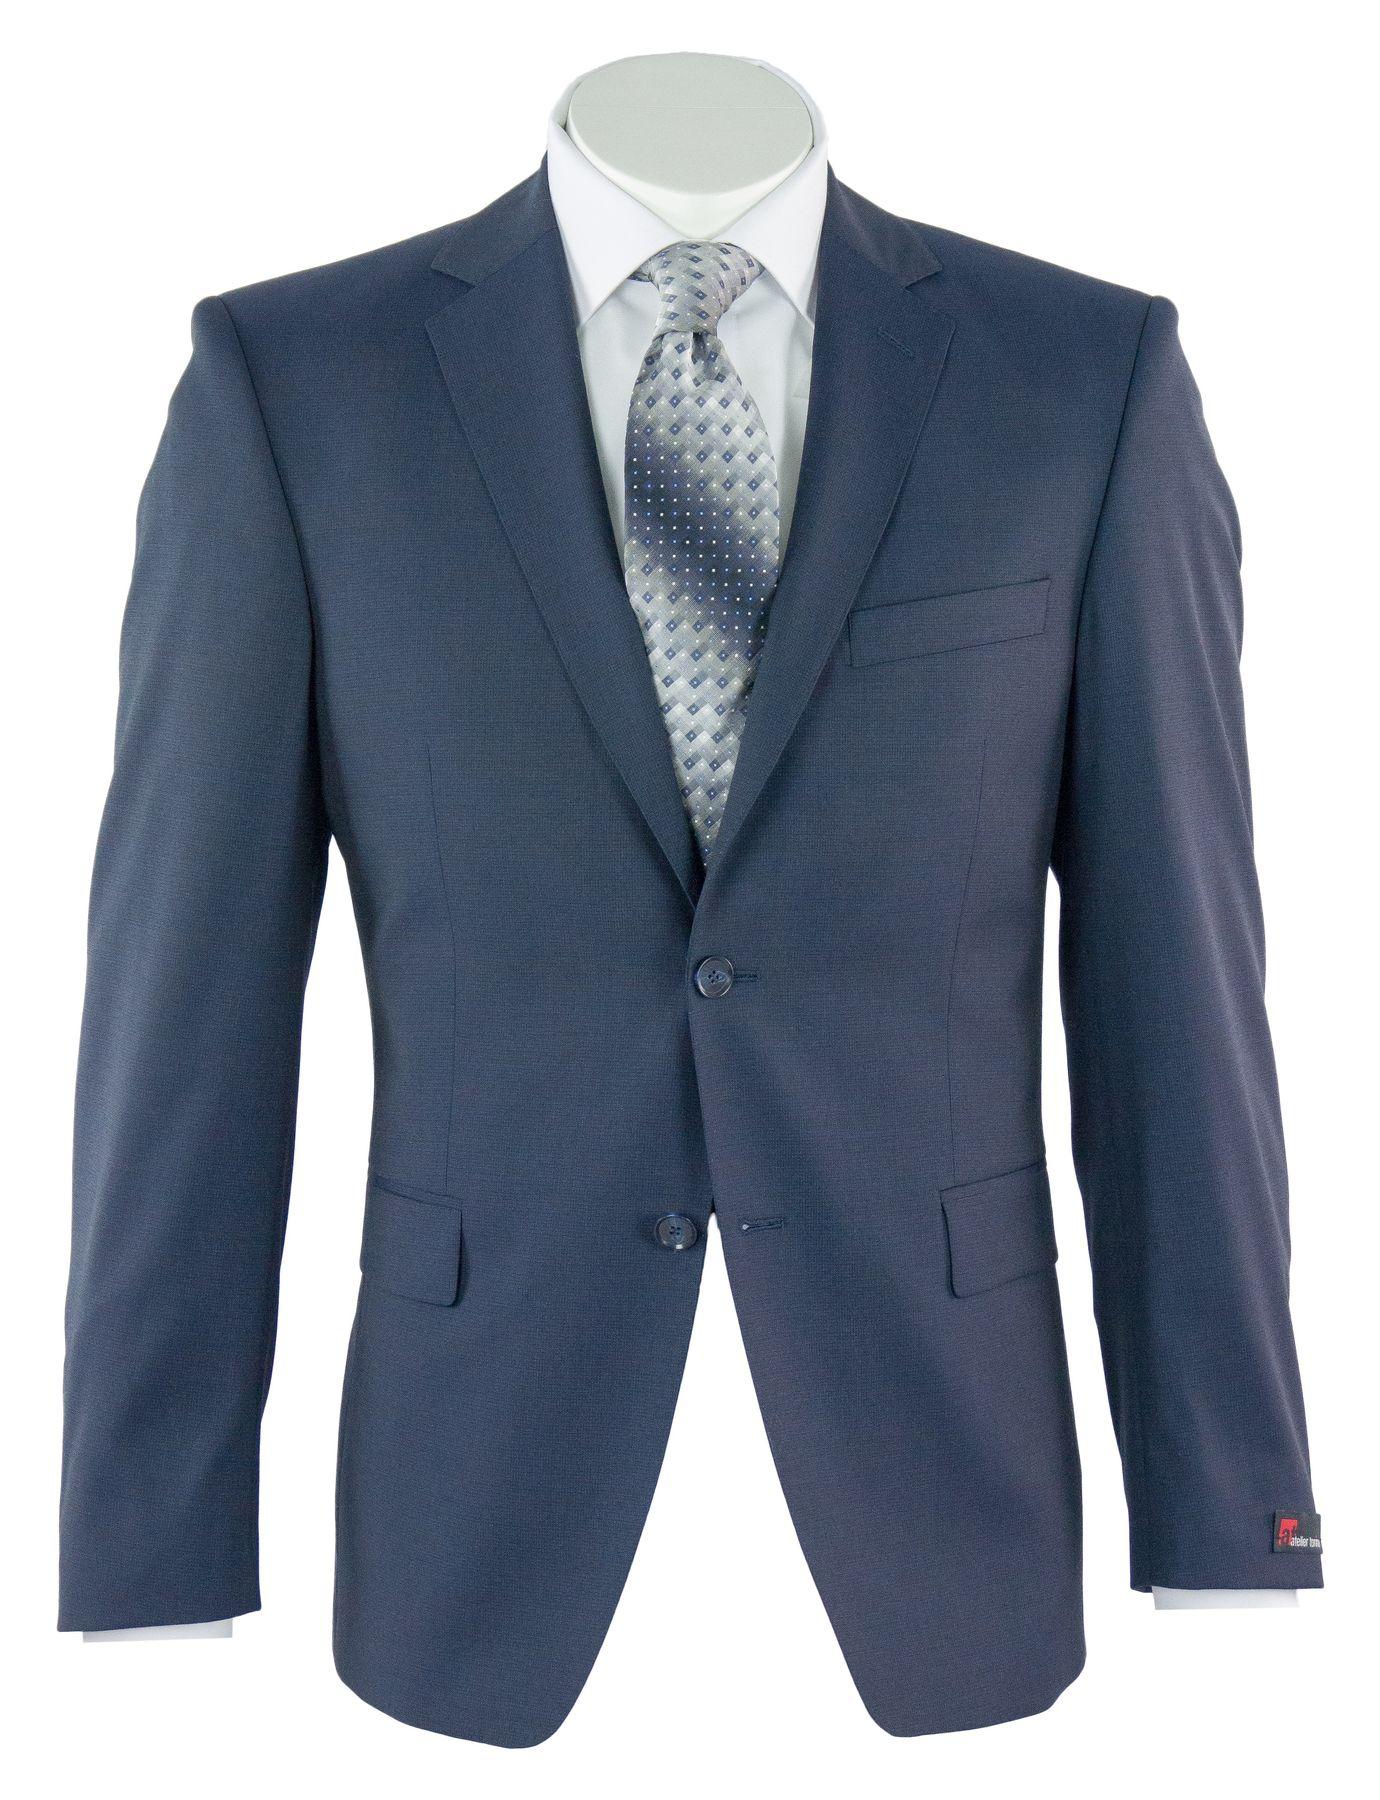 Atelier Torino - Modern Fit - Herren Baukasten Anzug in Dunkelblau, Minimal kariert, Weber: Tollegno, Roma SS/Aldo (841100) – Bild 1